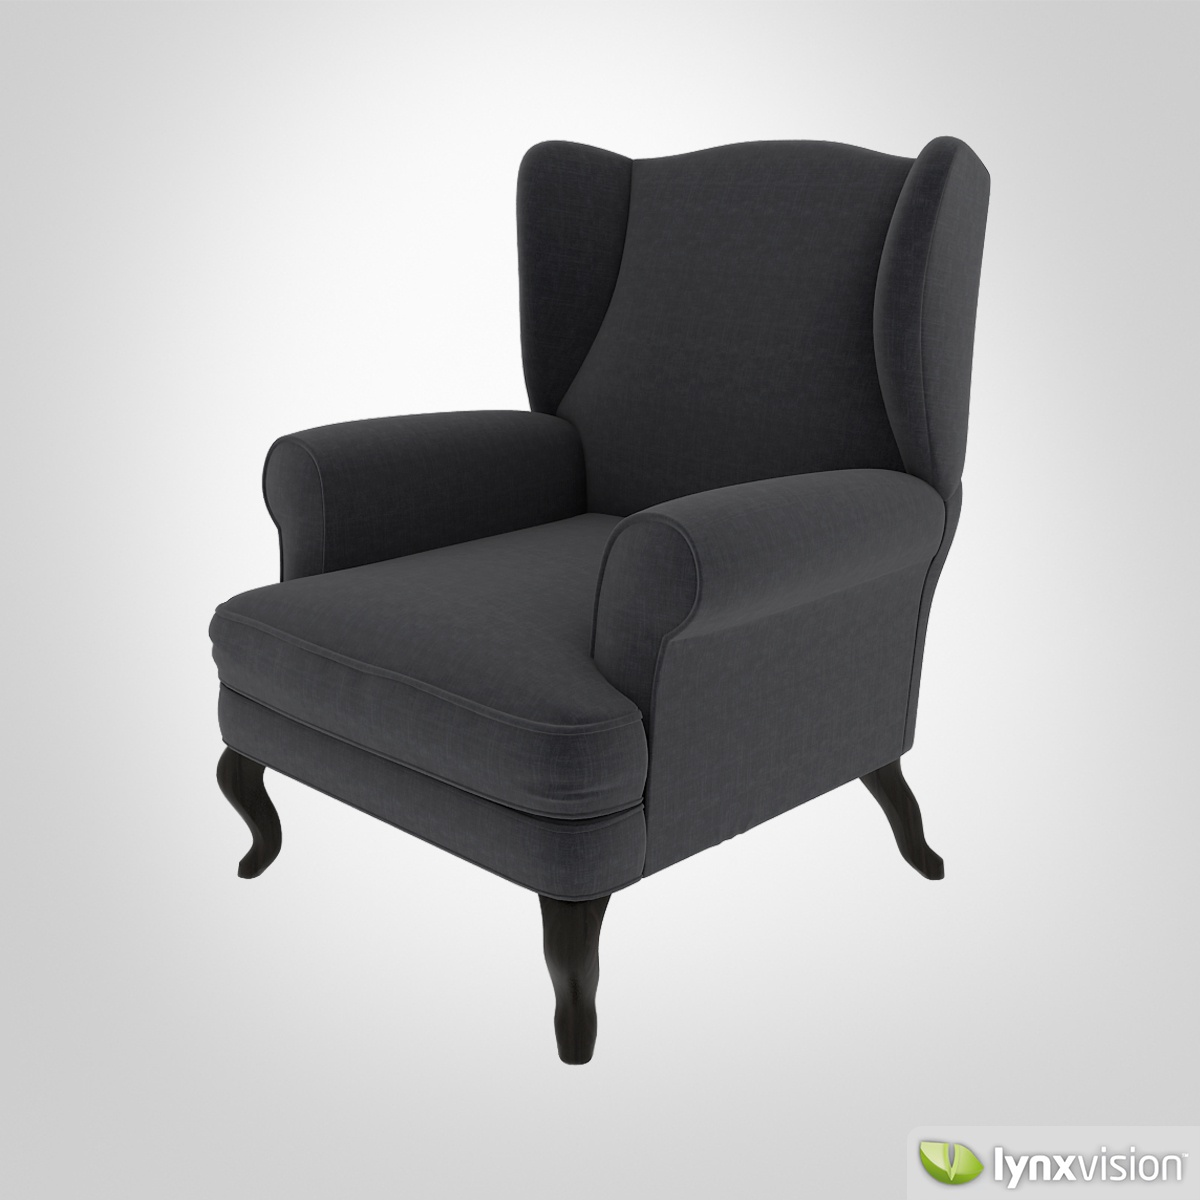 Free upholstered armchair free 3d model max obj fbx for Model furniture